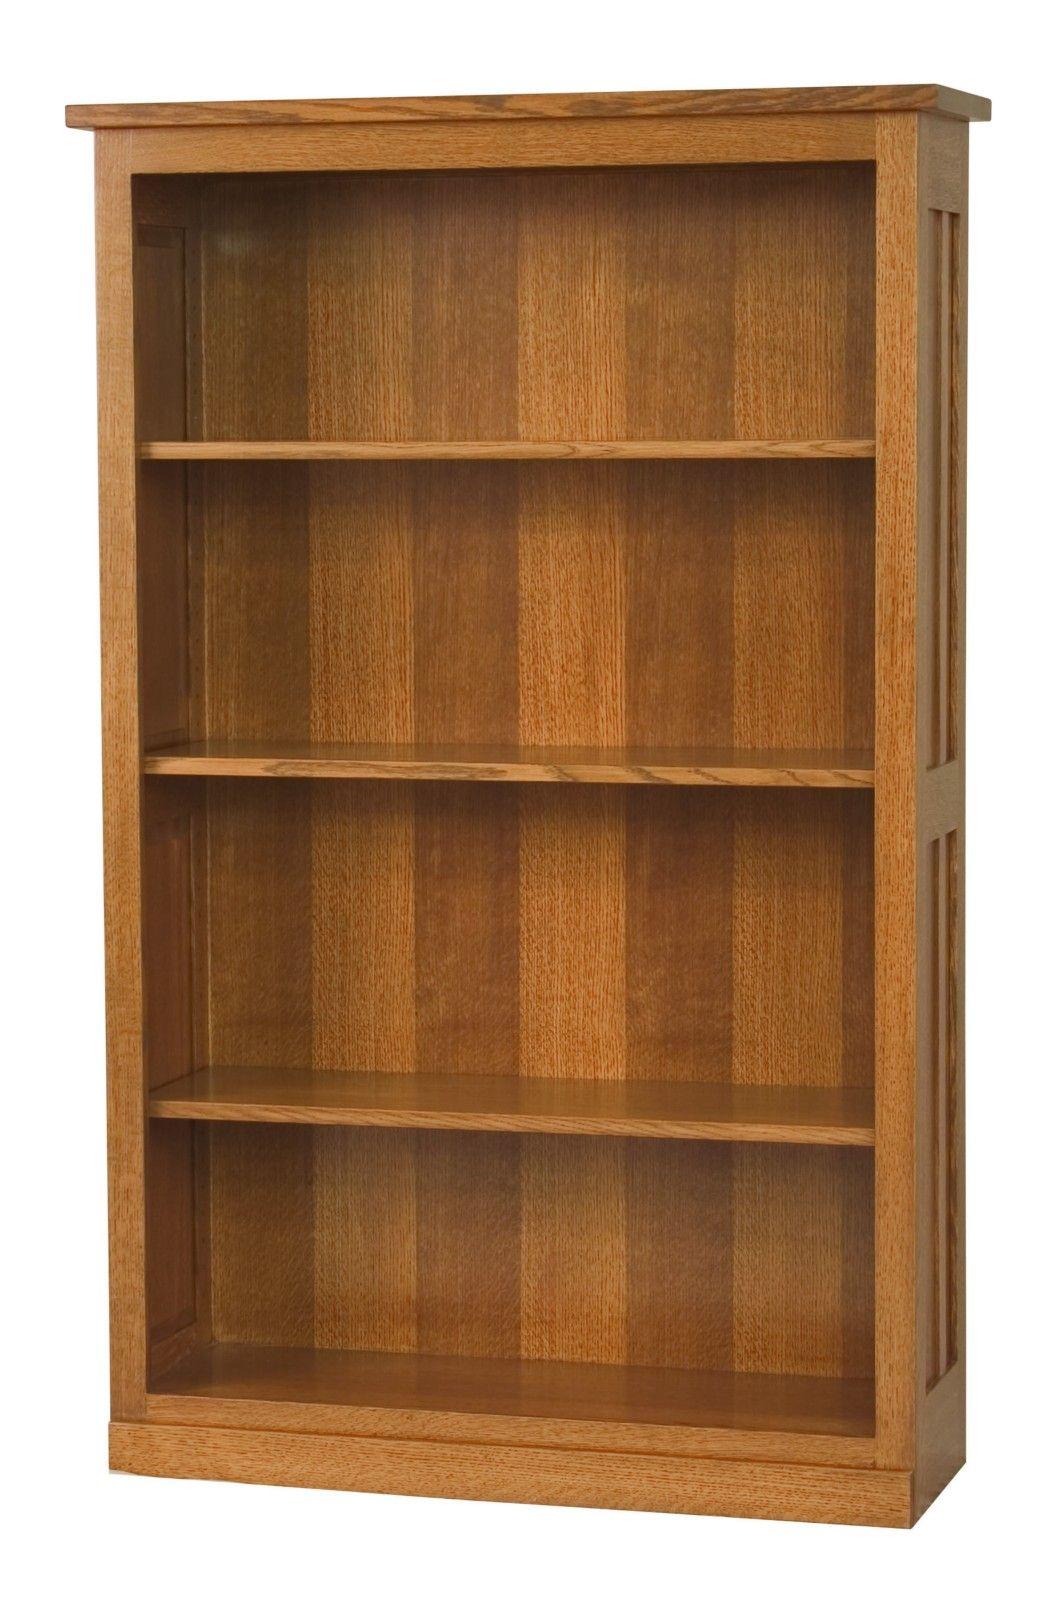 Furniture · Amish Heirlooms Furniture